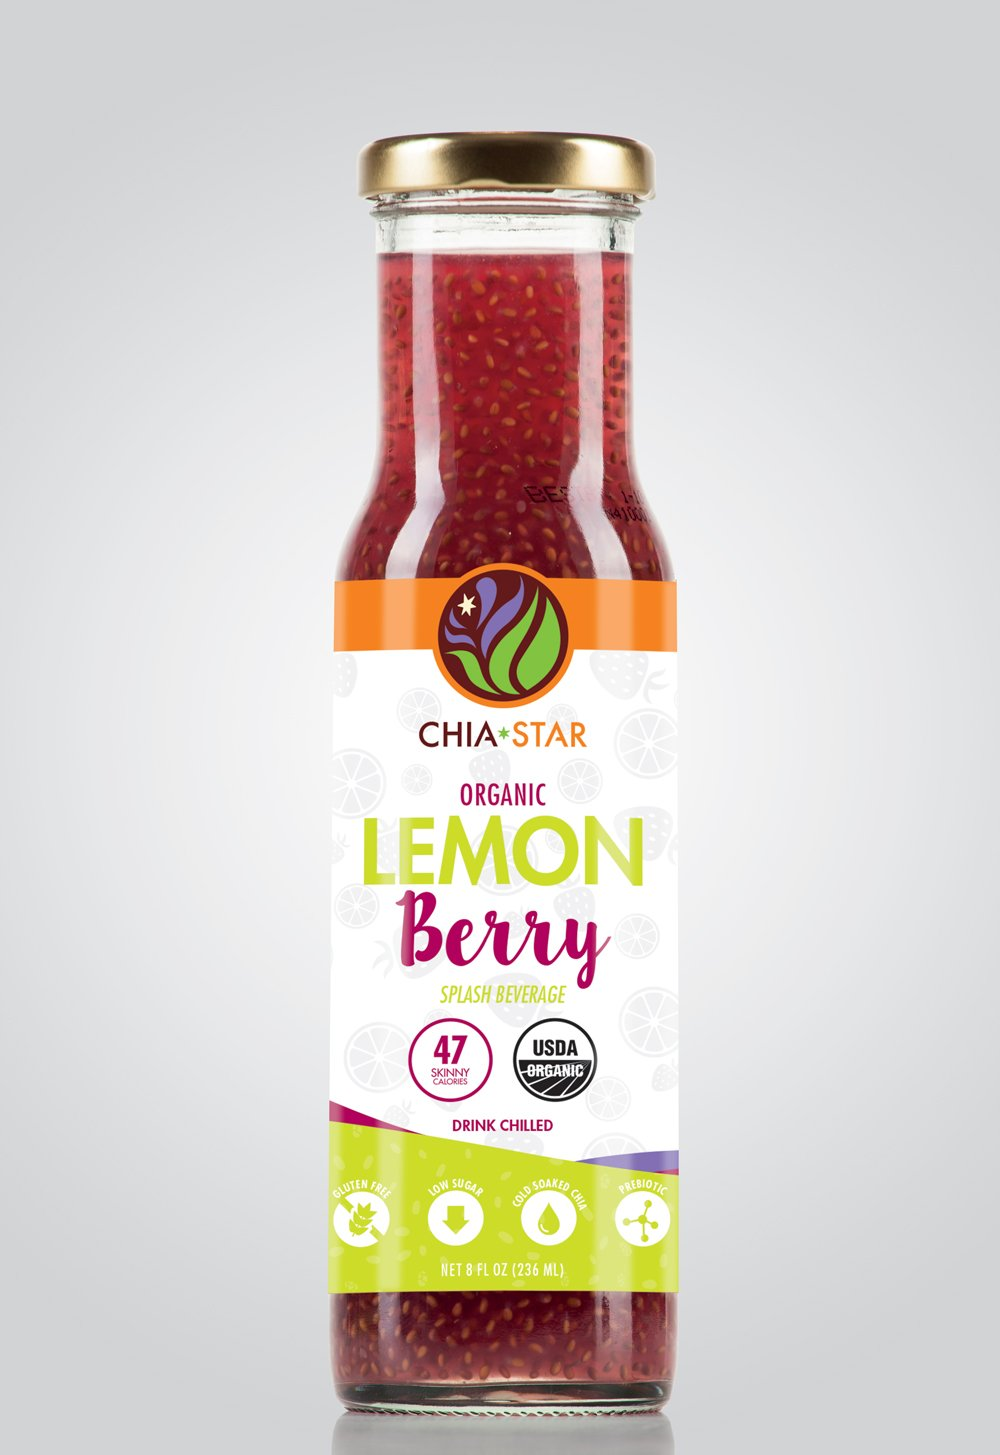 Chia Star Lemon Berry Splash three 8 oz bottles